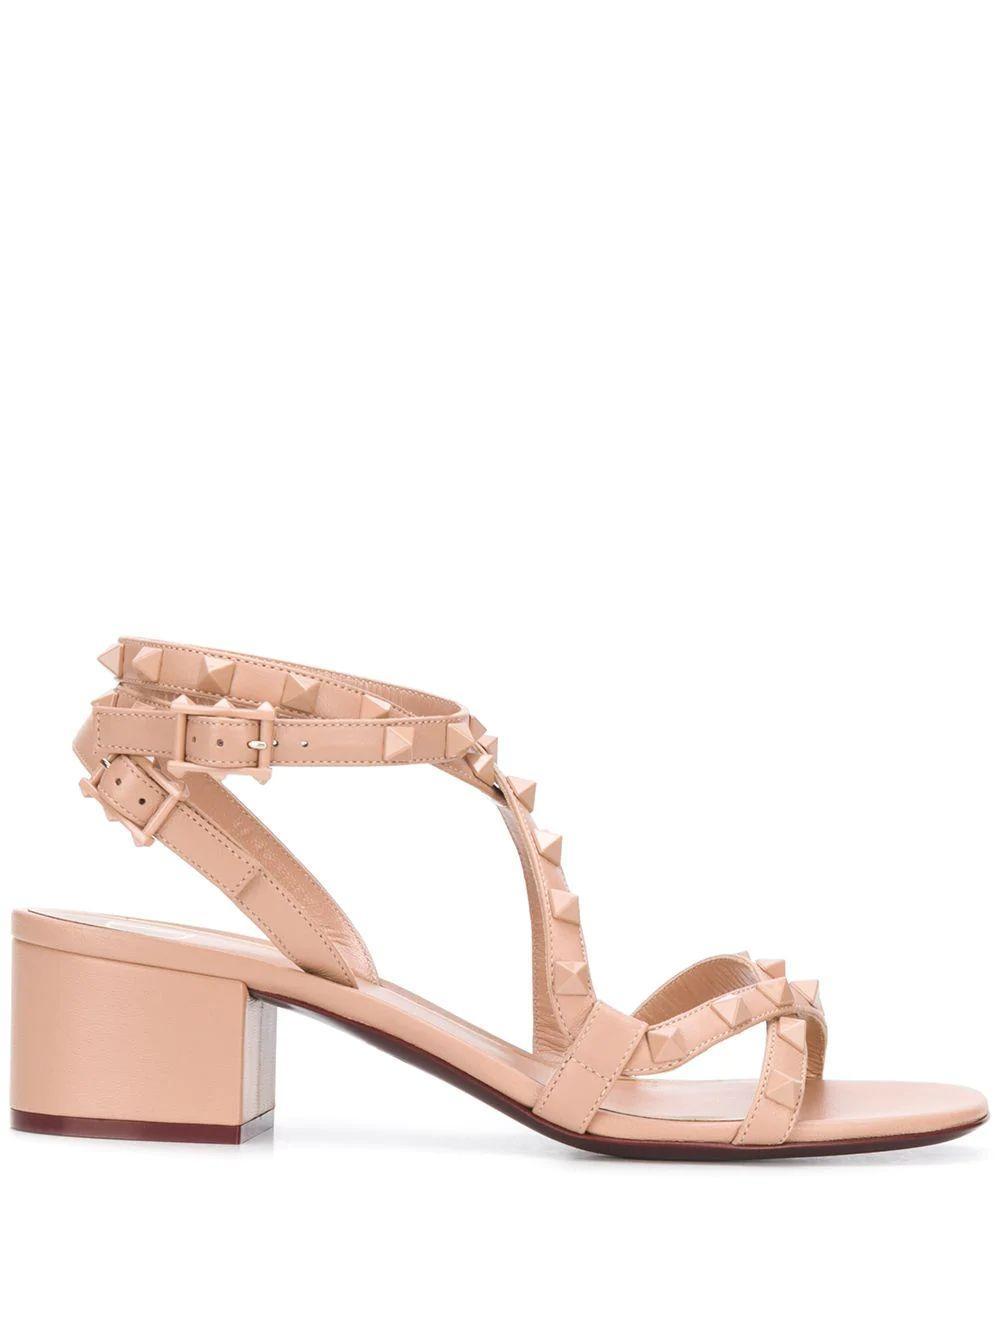 Rockstud 45mm Block Heel Sandal Item # TW0S0Y20MLRGF9